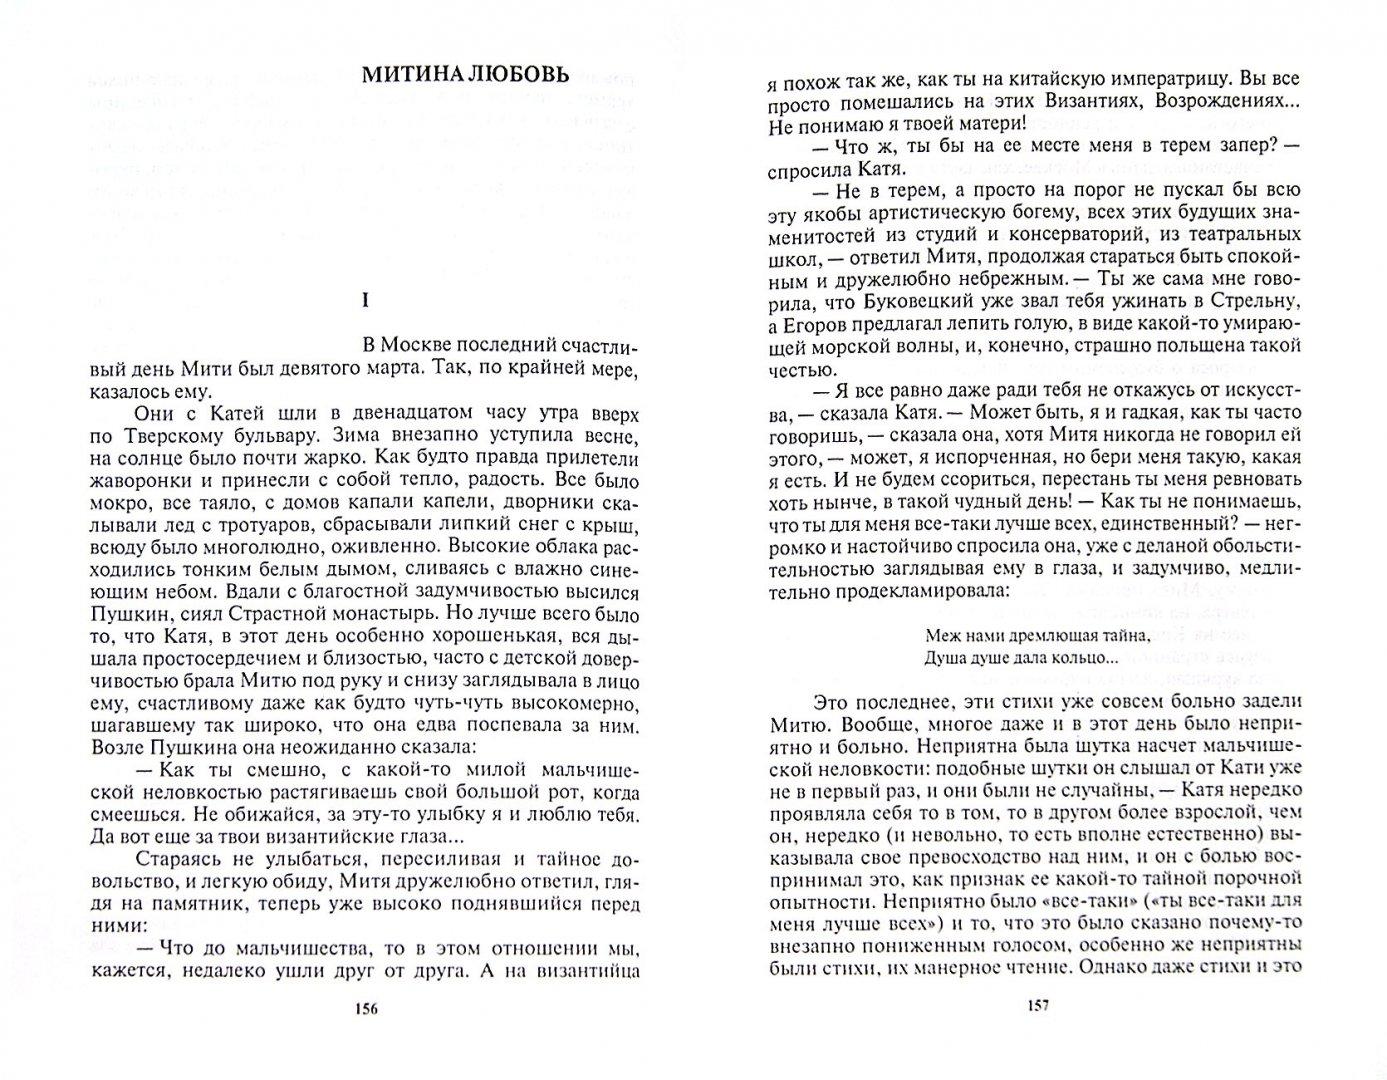 Иллюстрация 1 из 4 для Бунин Иван Алексеевич - Иван Бунин   Лабиринт - книги. Источник: Лабиринт